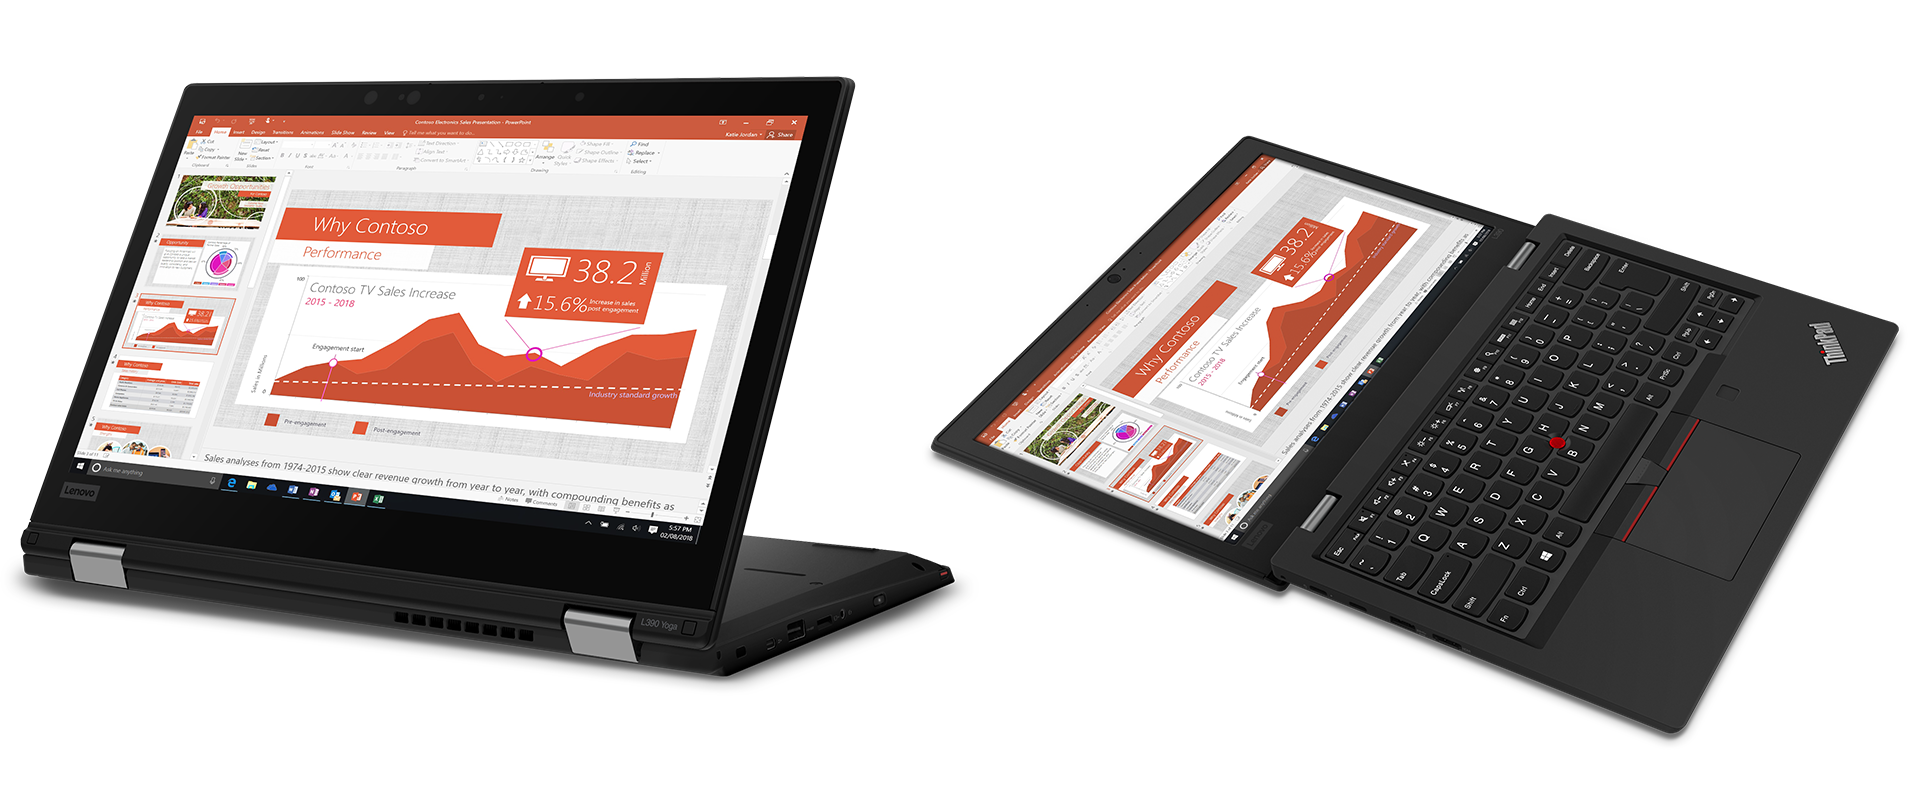 Image of the Lenovo ThinkPad L390 and L390 Yoga.